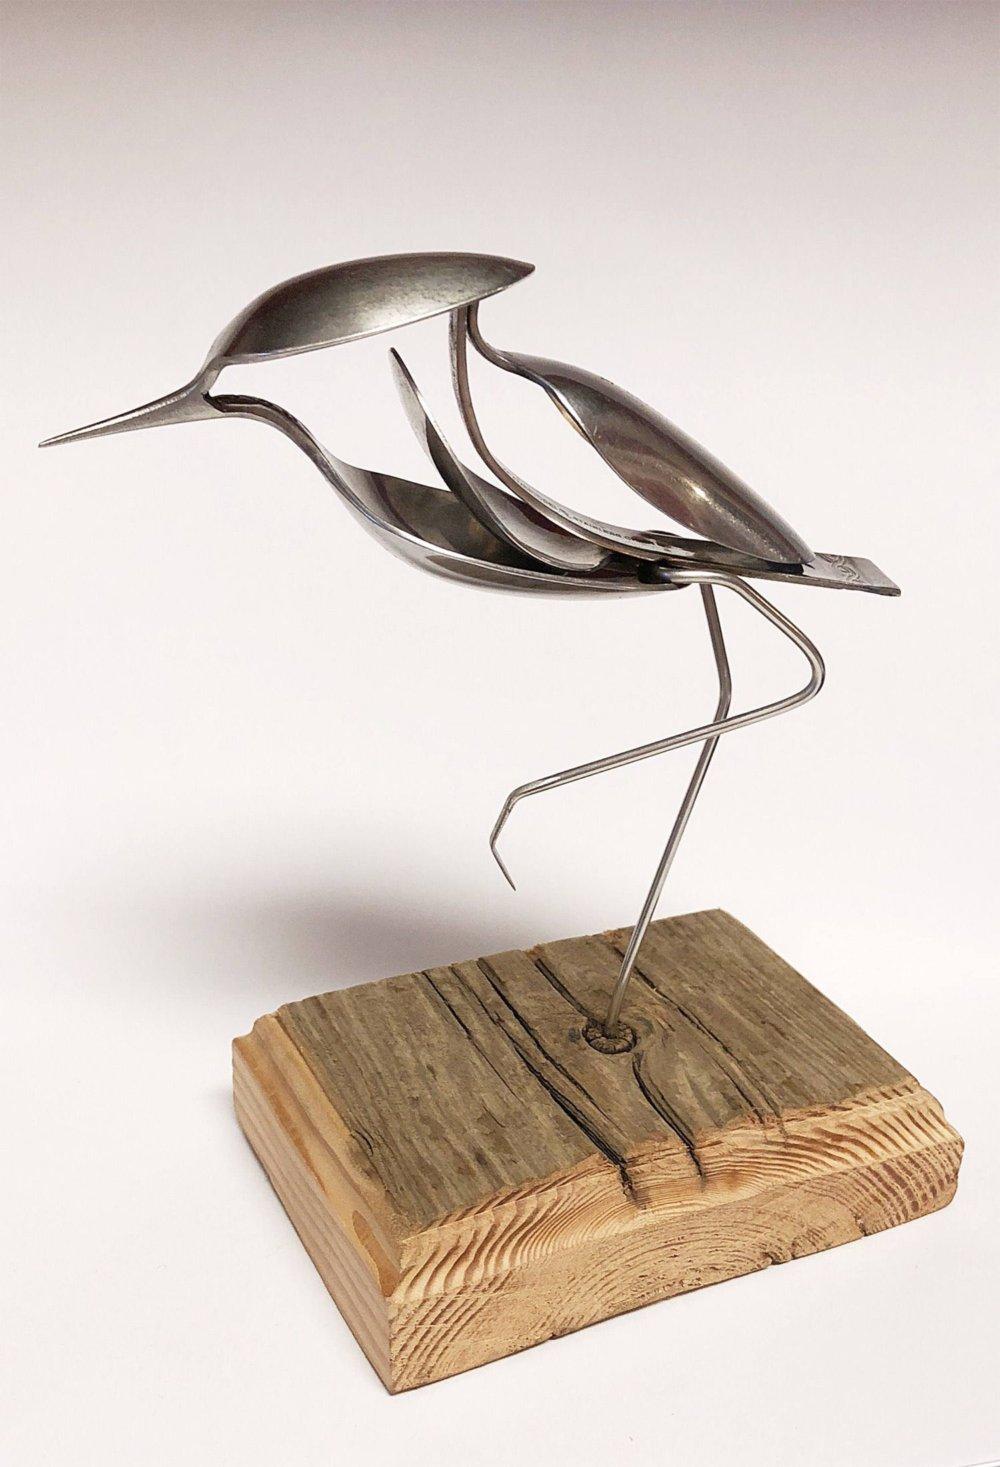 Incredible Silverware Animal Sculptures By Matt Wilson 2